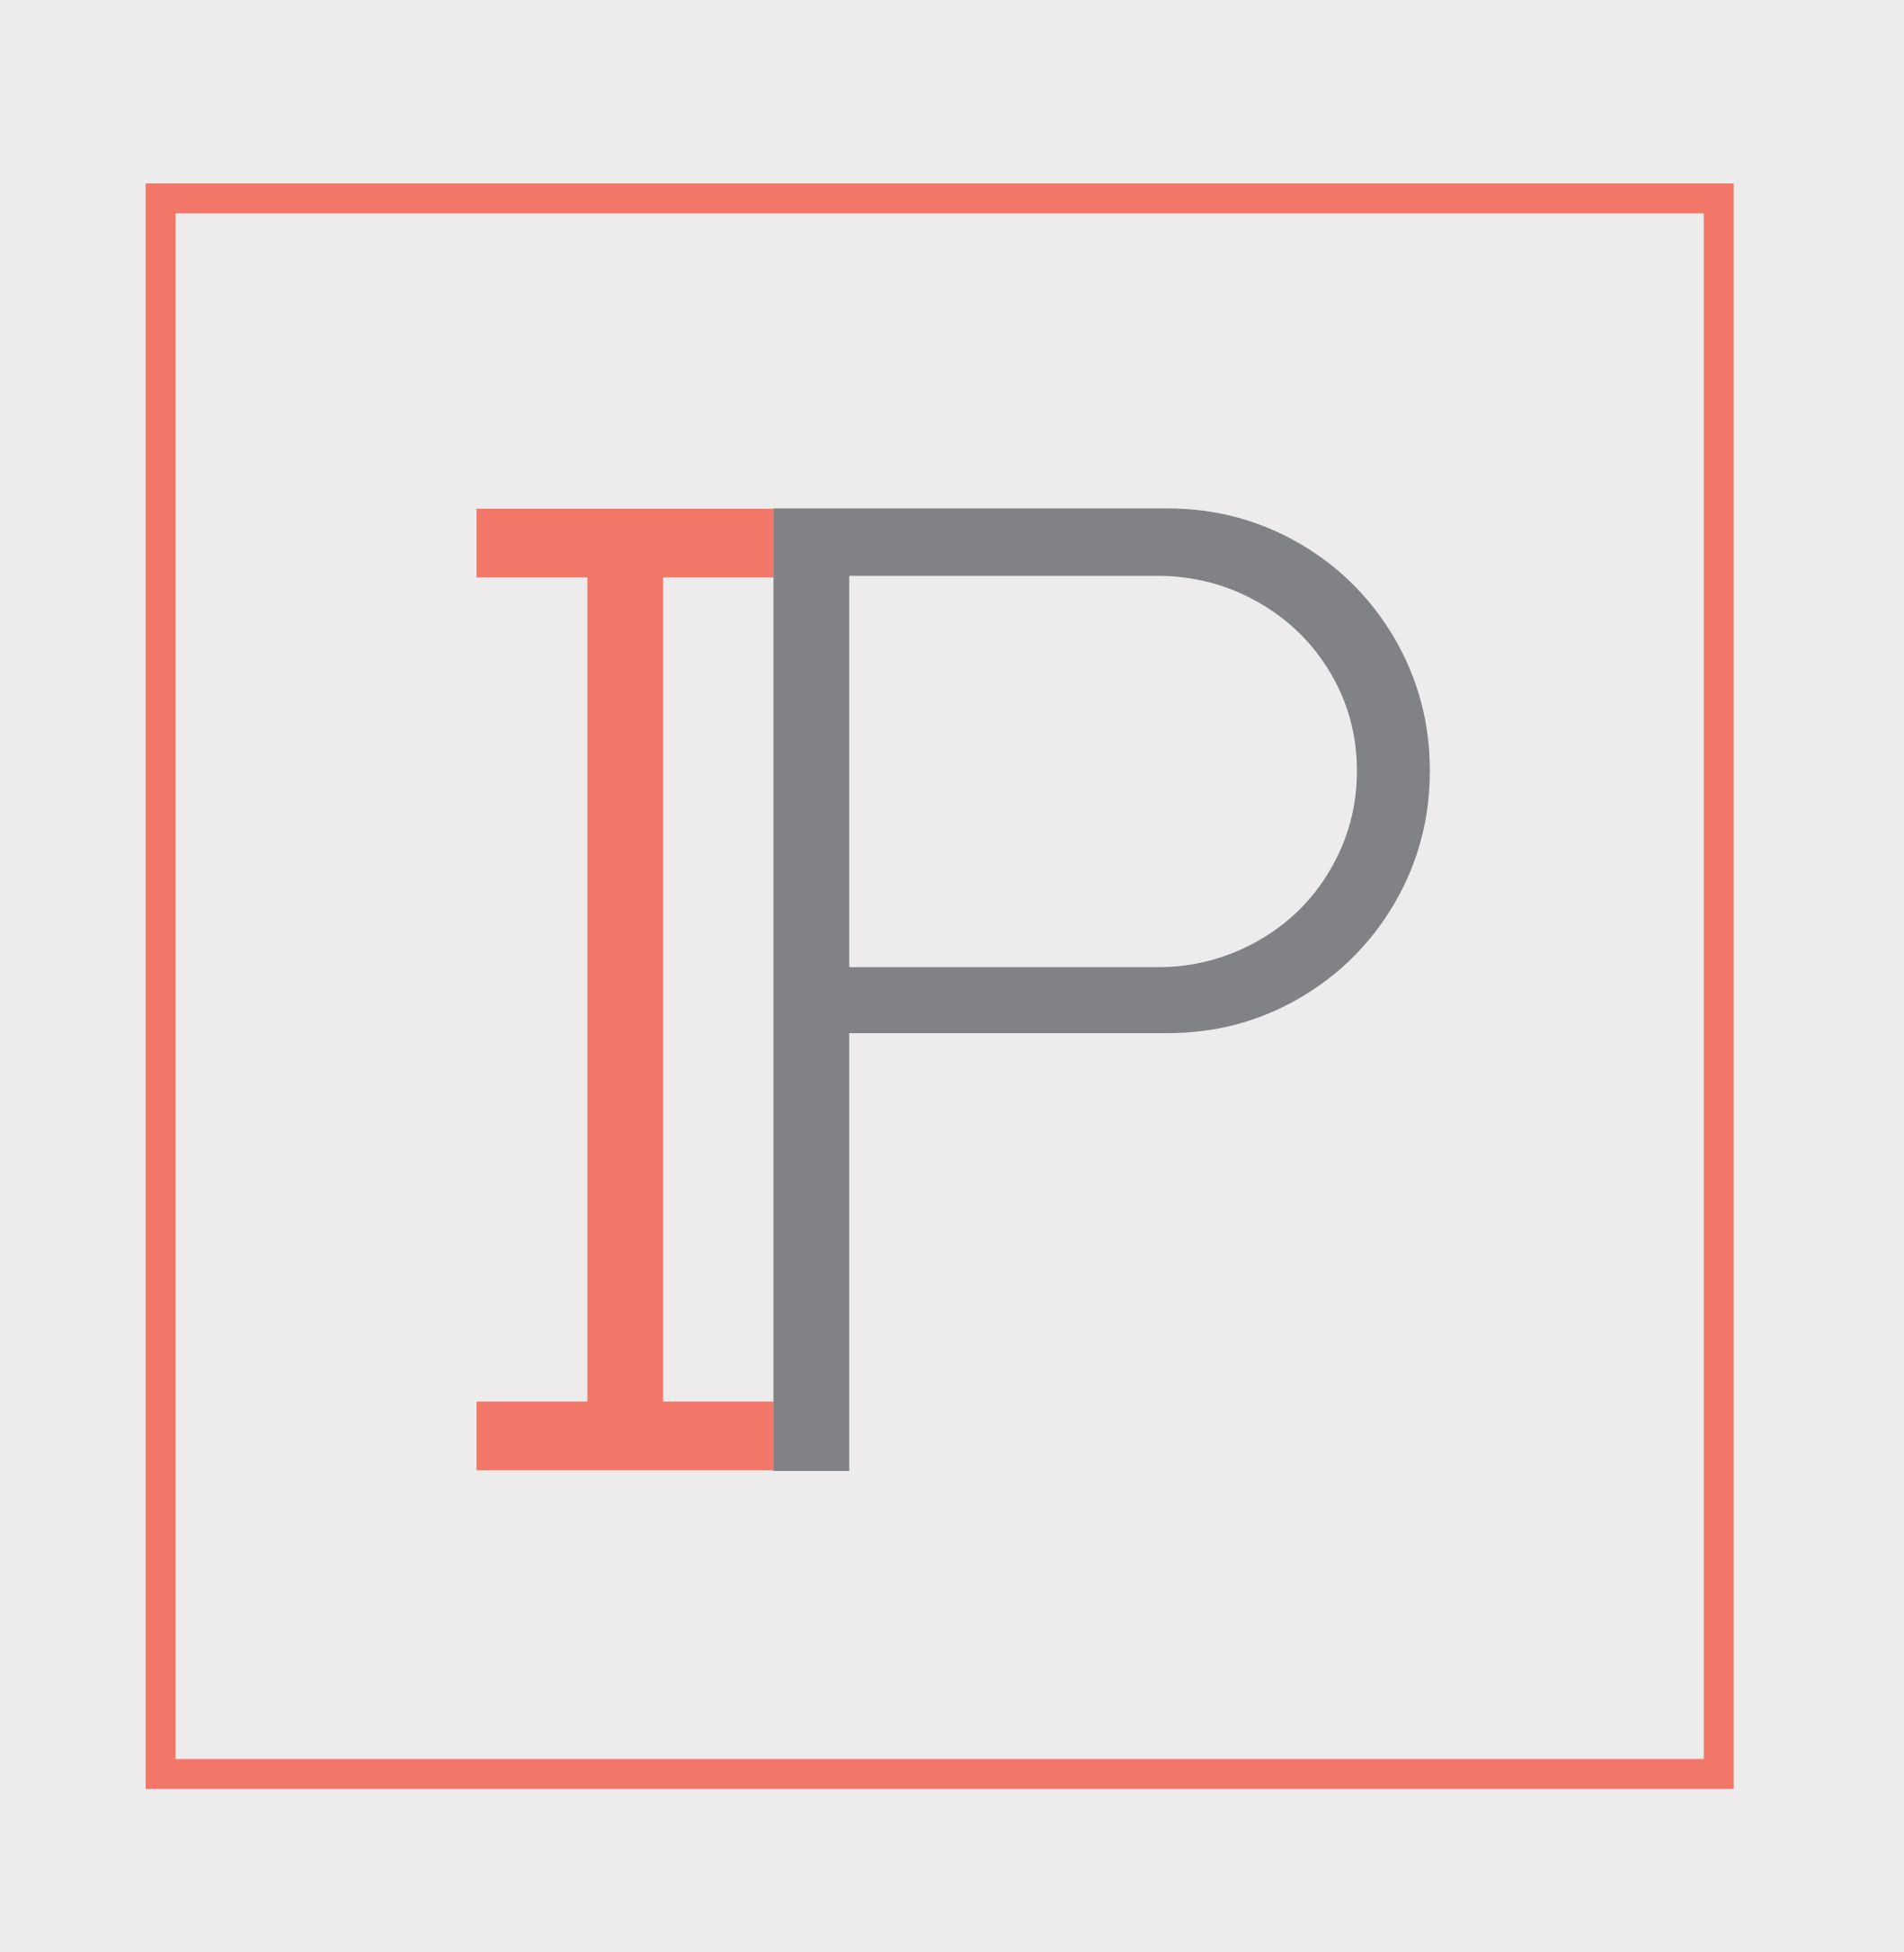 Logo de  Pinamarinmuebles